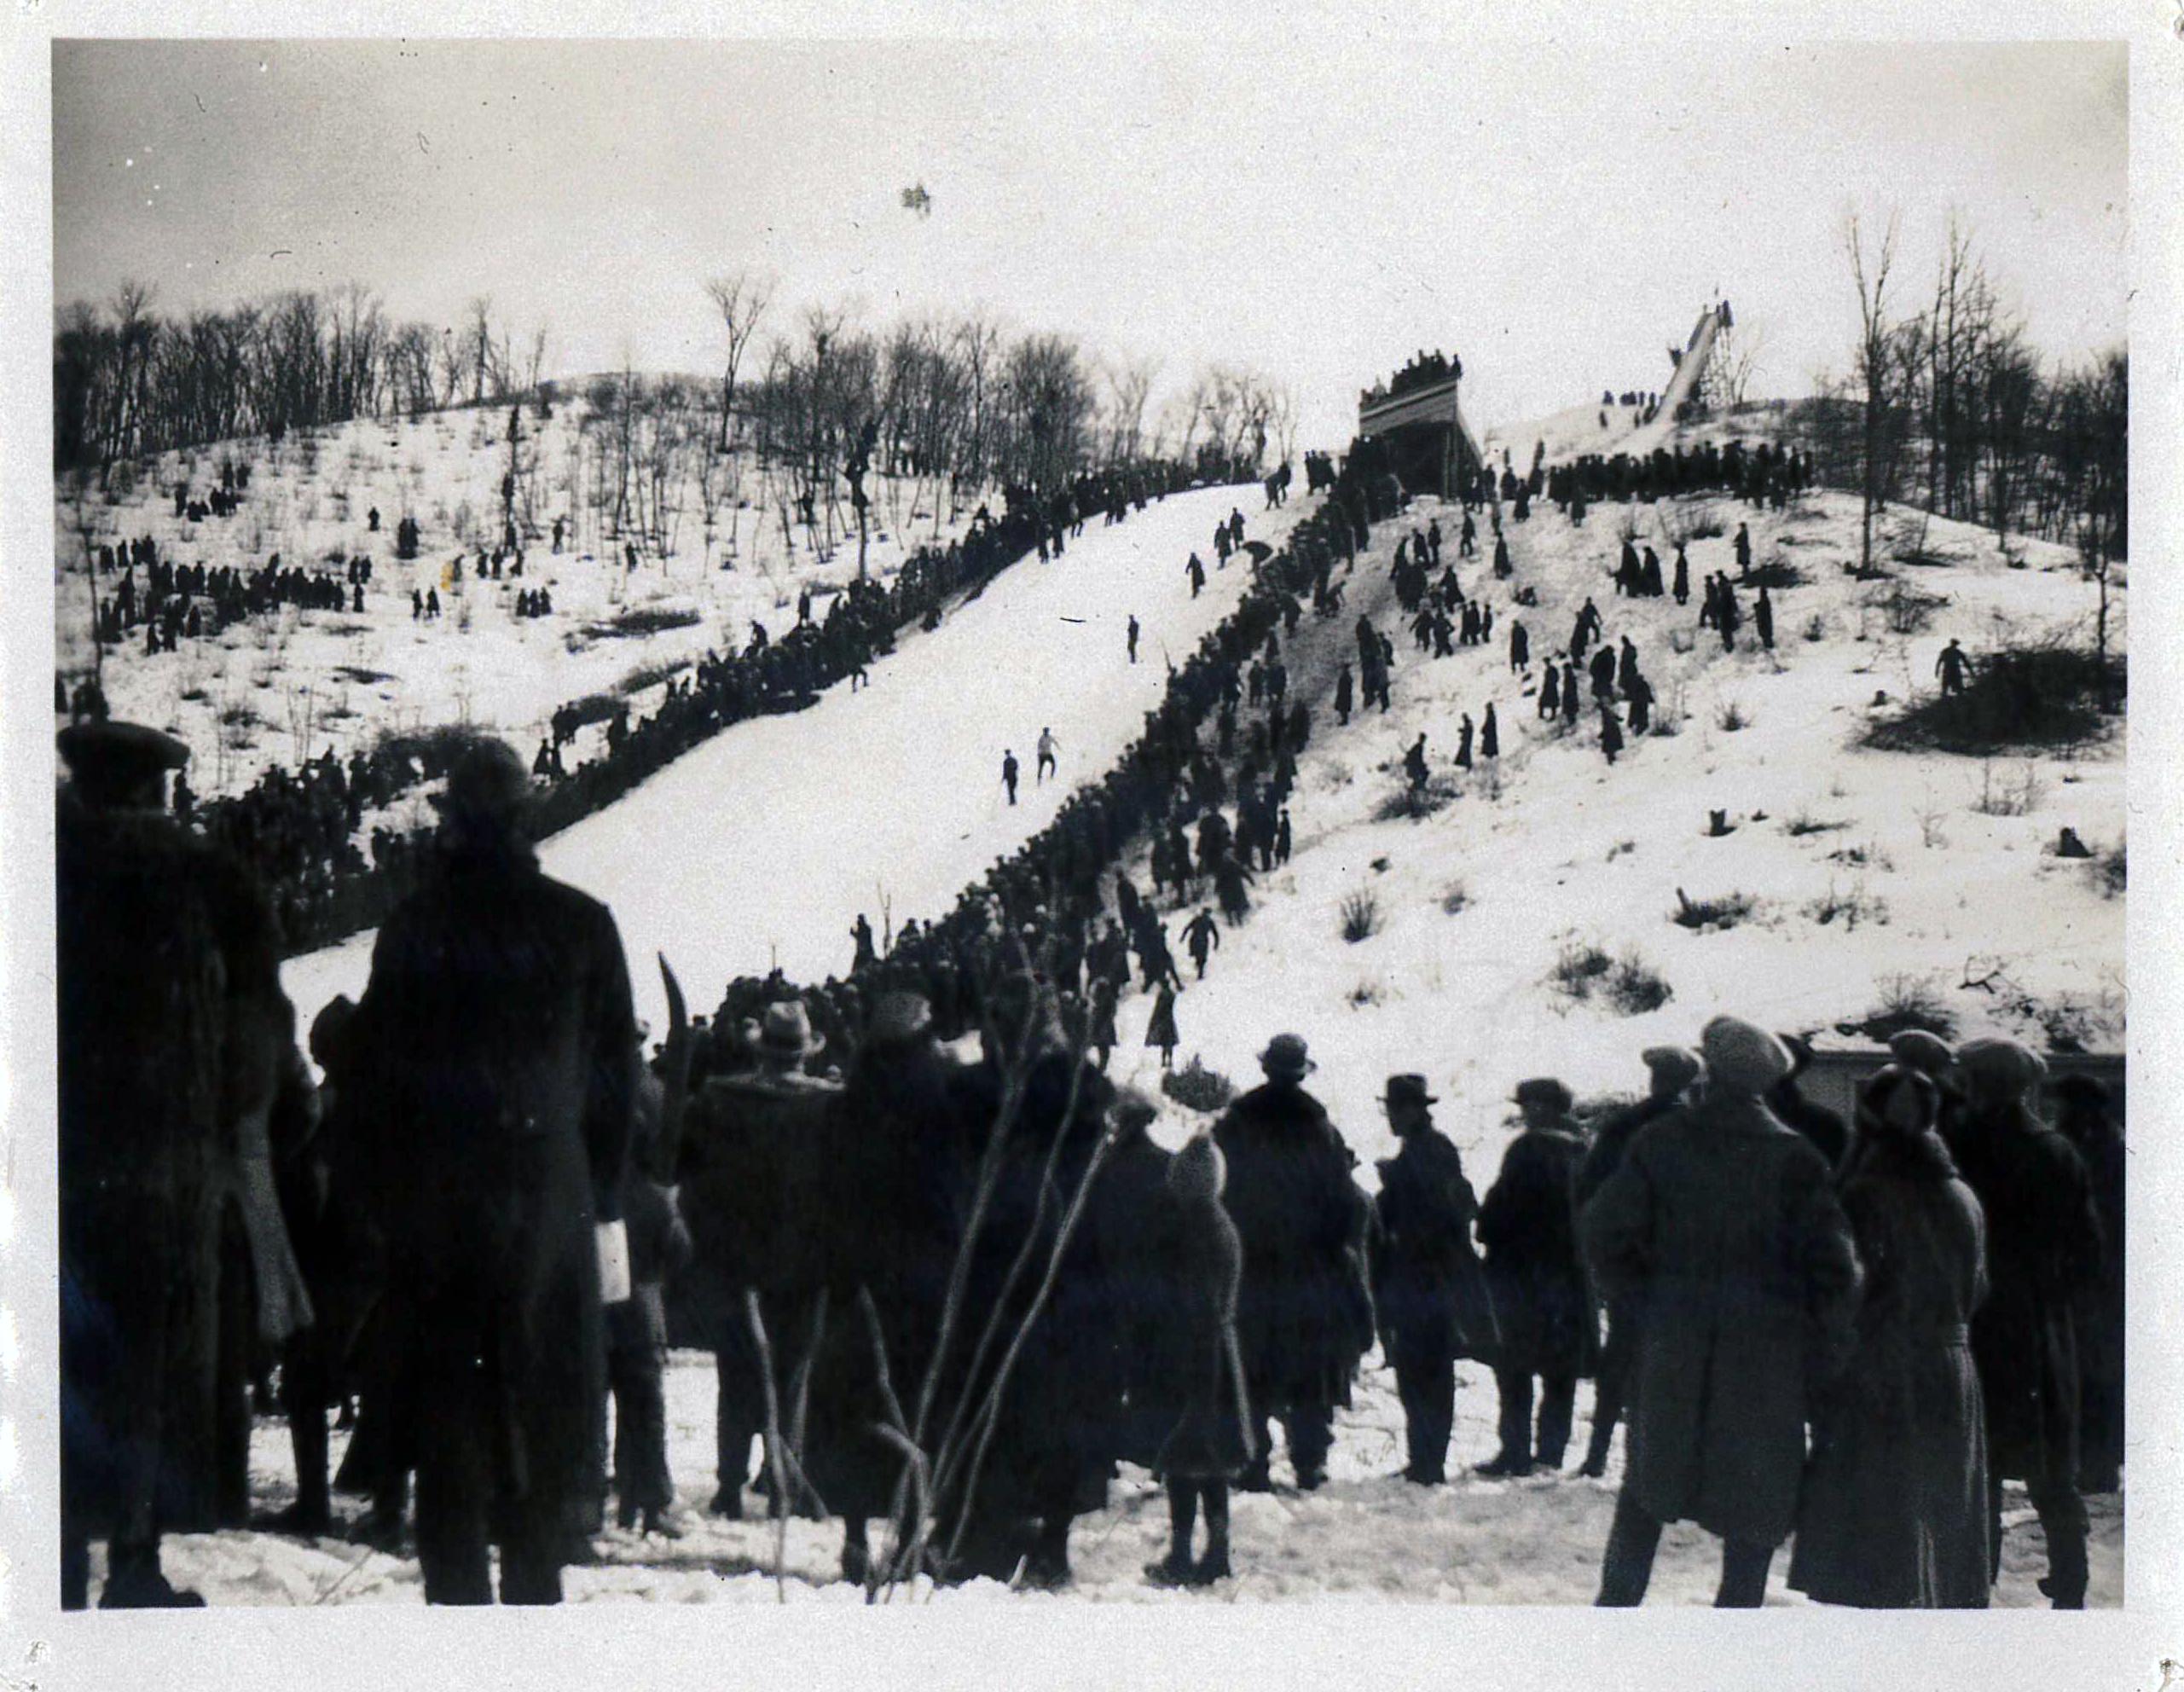 Image - 1912.jpg